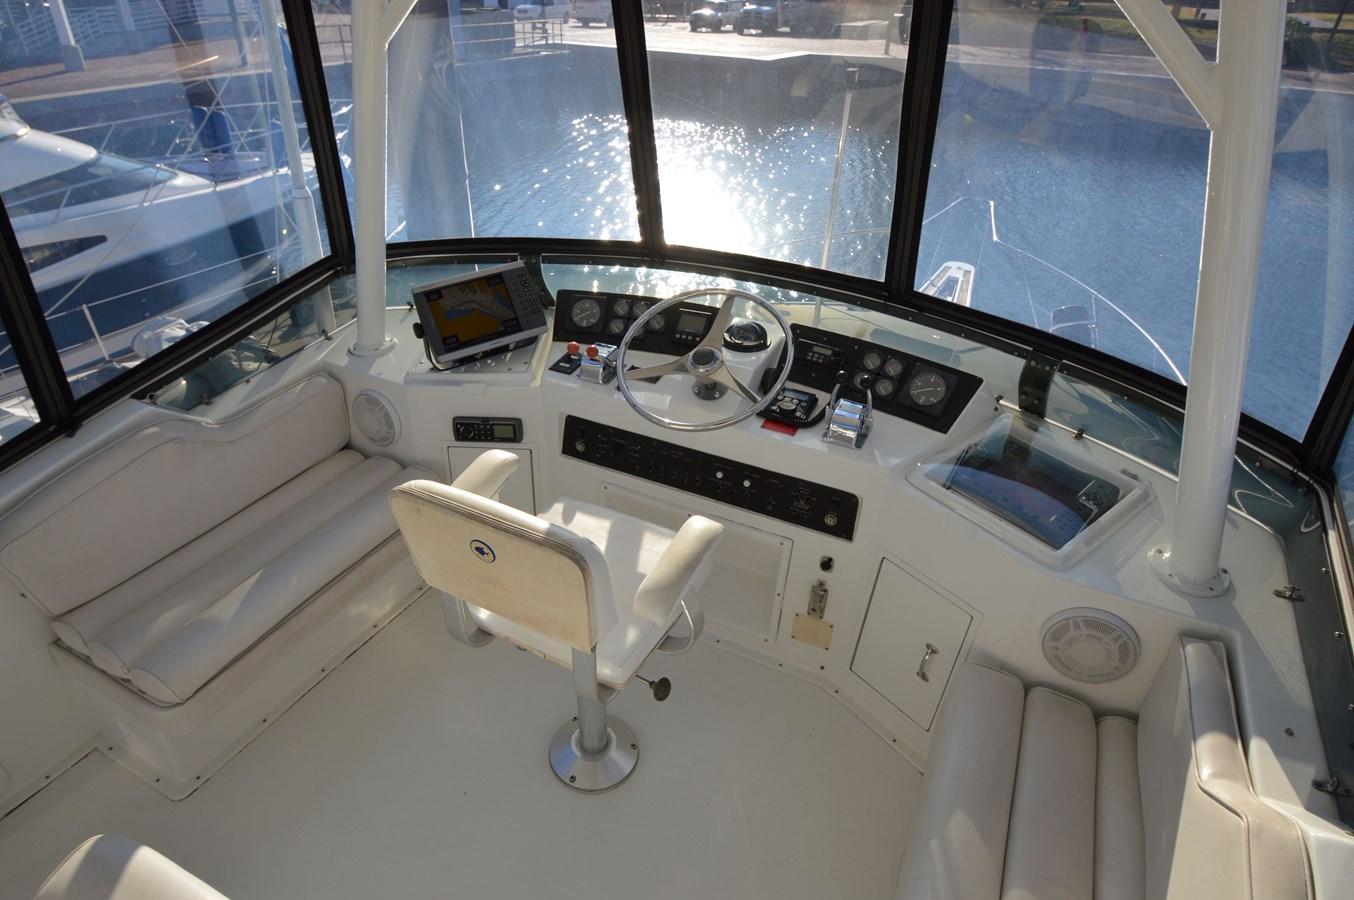 1995 42 Hatteras Cockpit Motoryacht - 42 HATTERAS For Sale